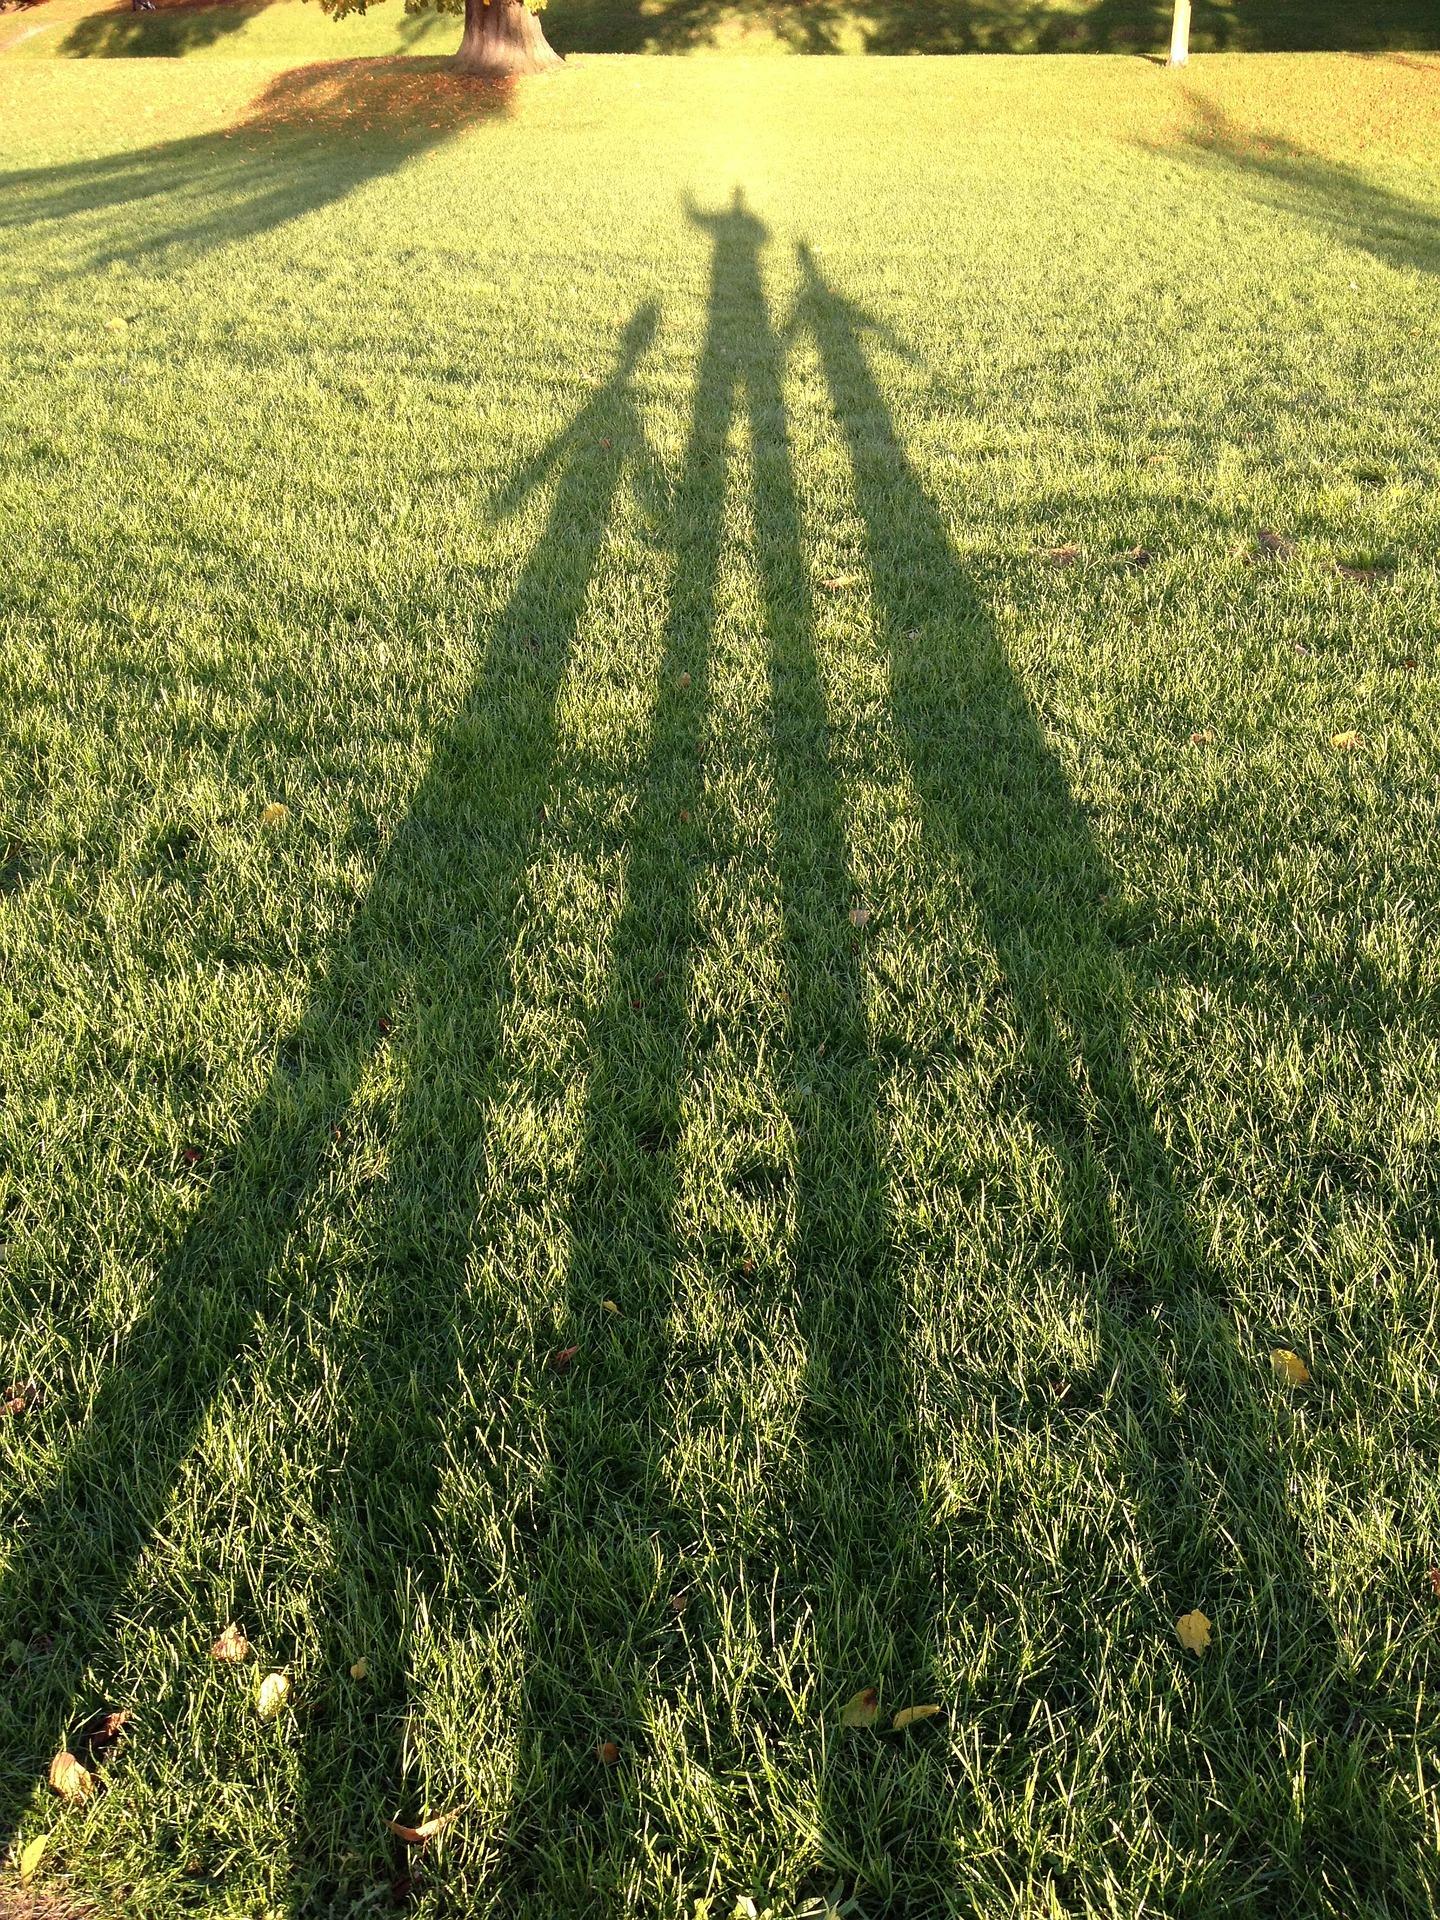 shadows-265295_1920